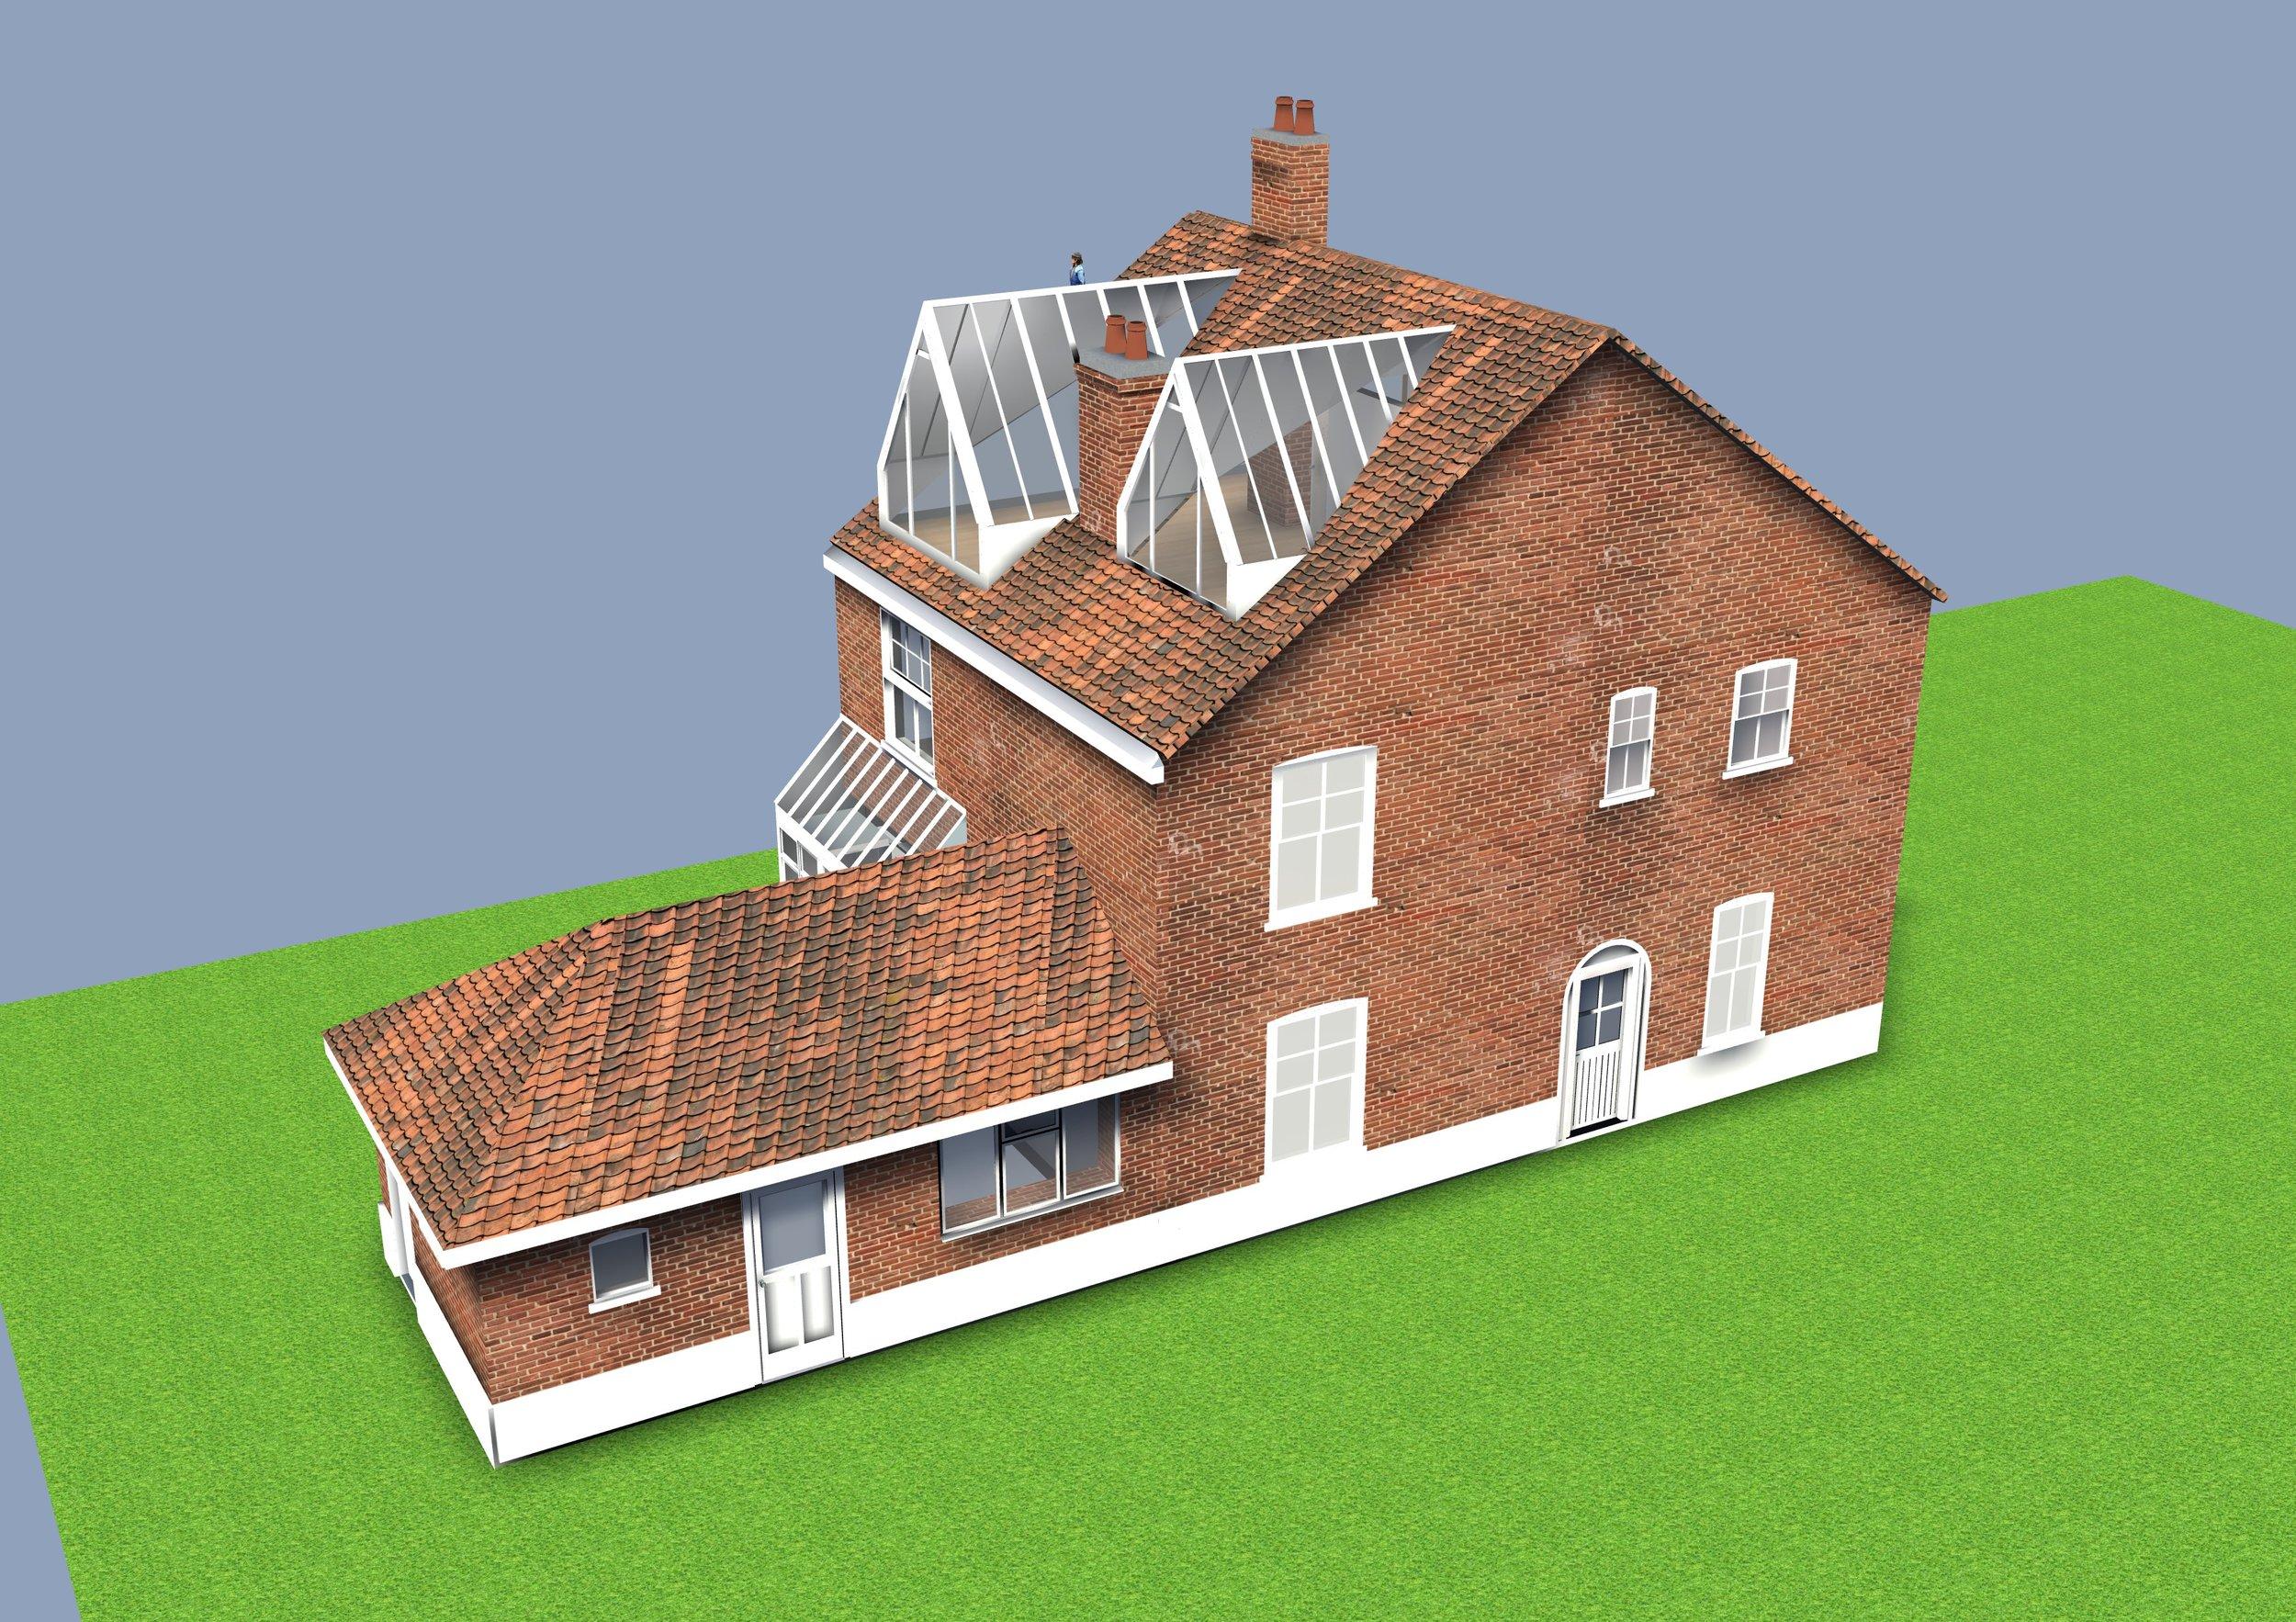 Exterior view of 3D model.